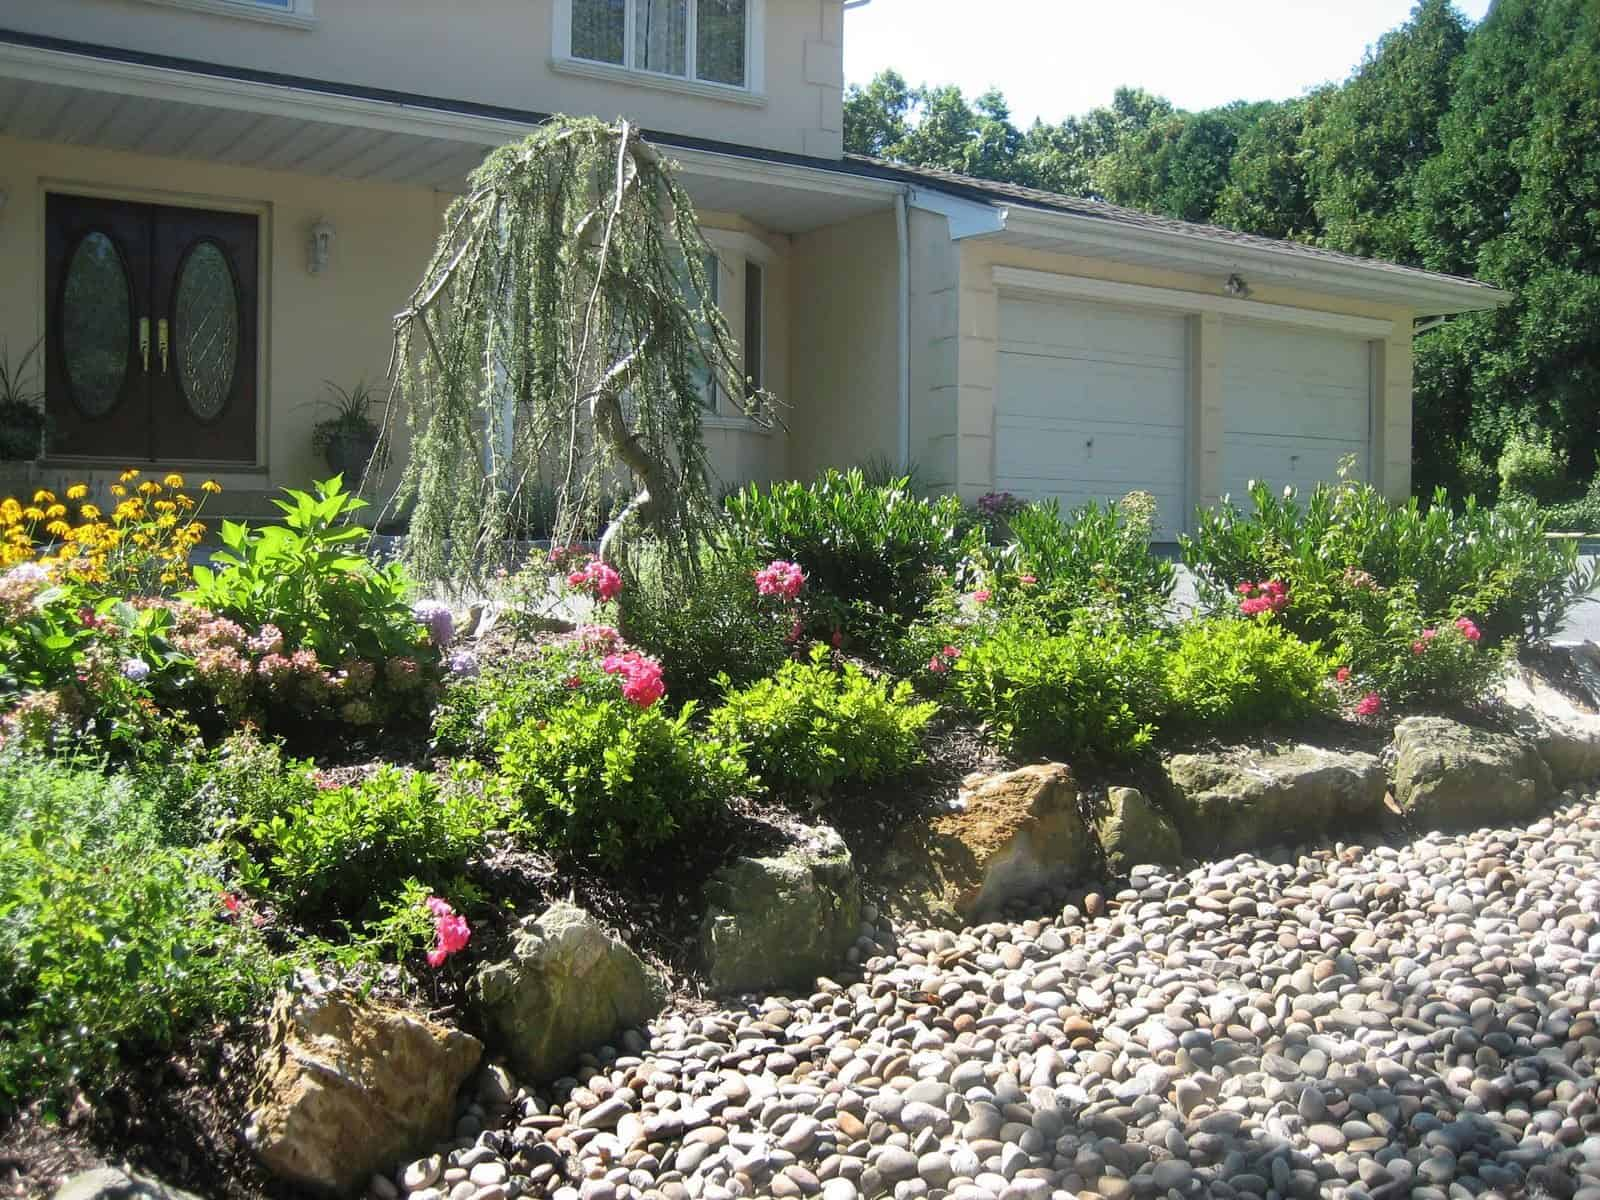 Landscape Plantings - Weeping Blue Atlas Cedar, Cherrylaurel Otto Luyken, and Pink Carpet Rose - Dix Hills, Long Island NY